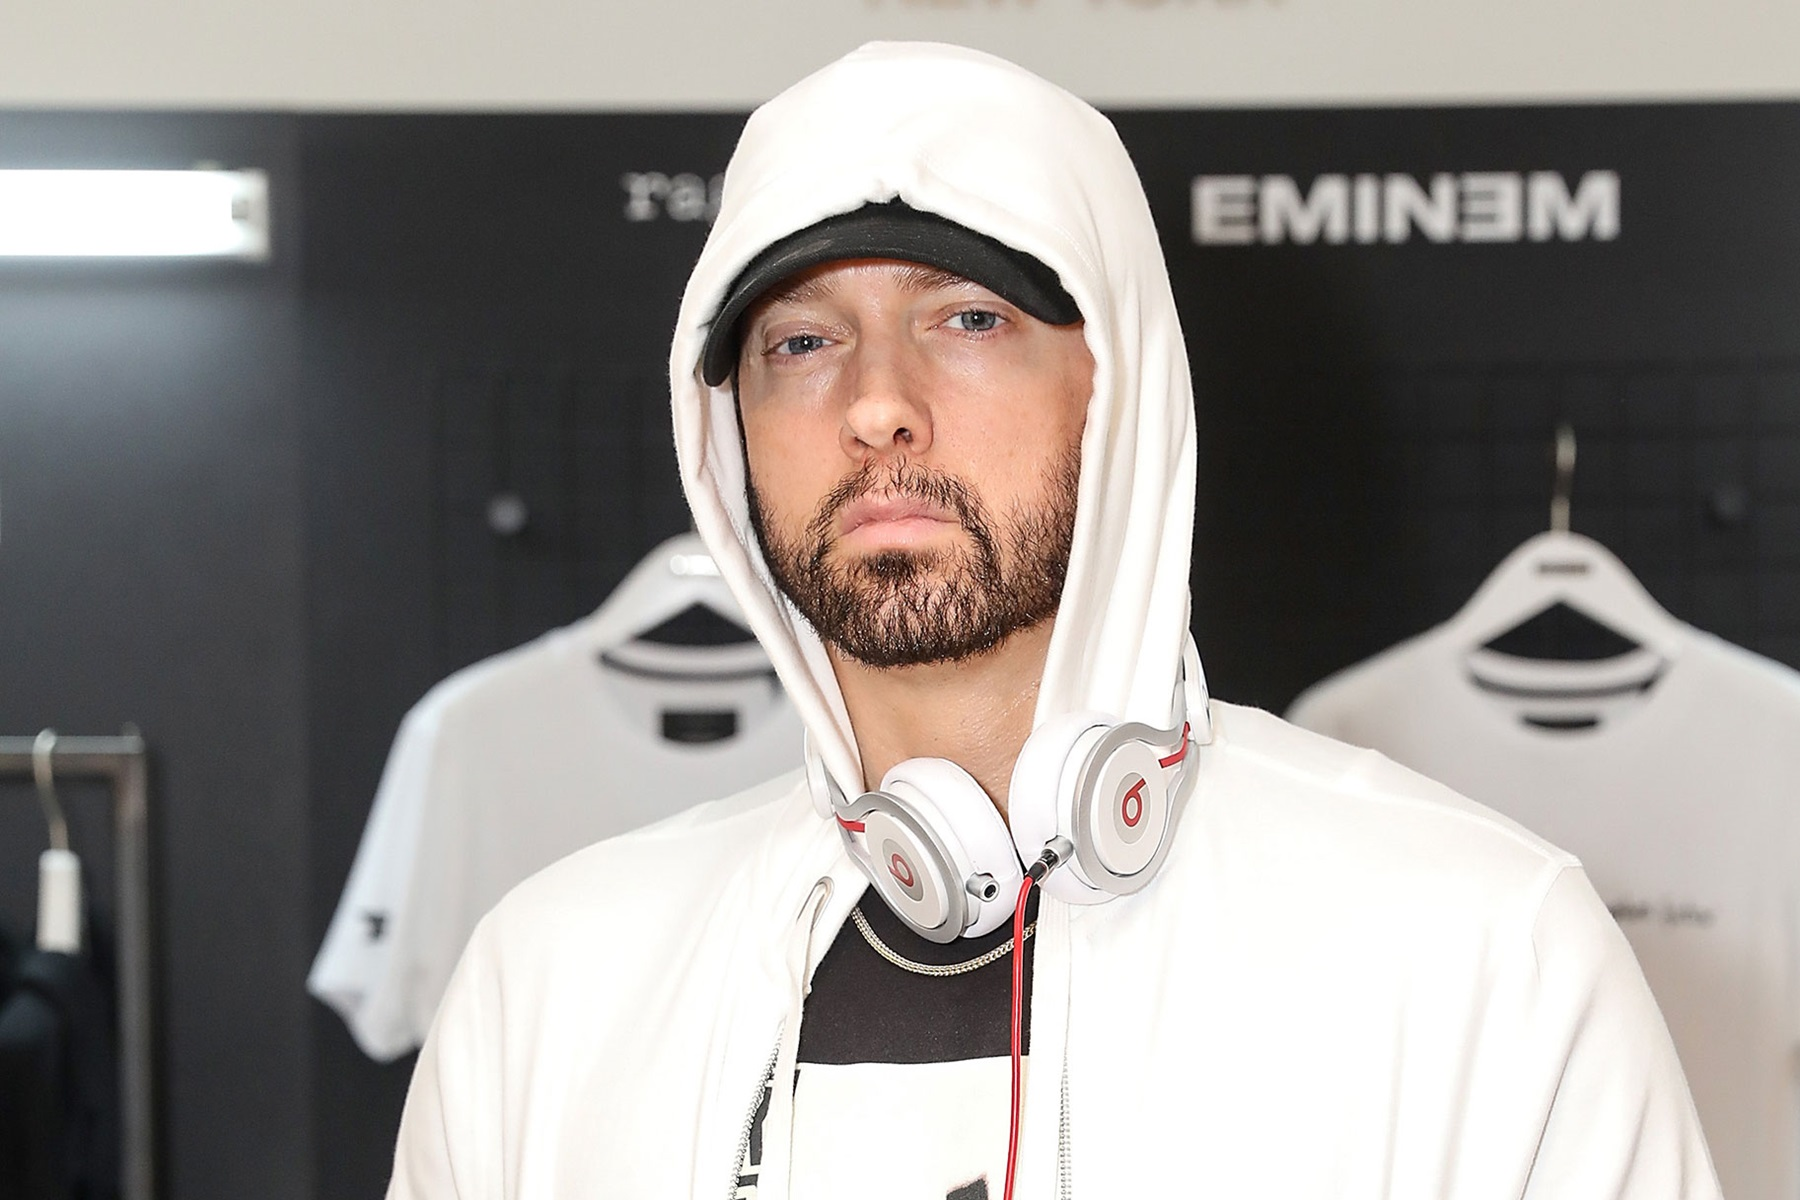 Eminem Donald Trump Secret Service